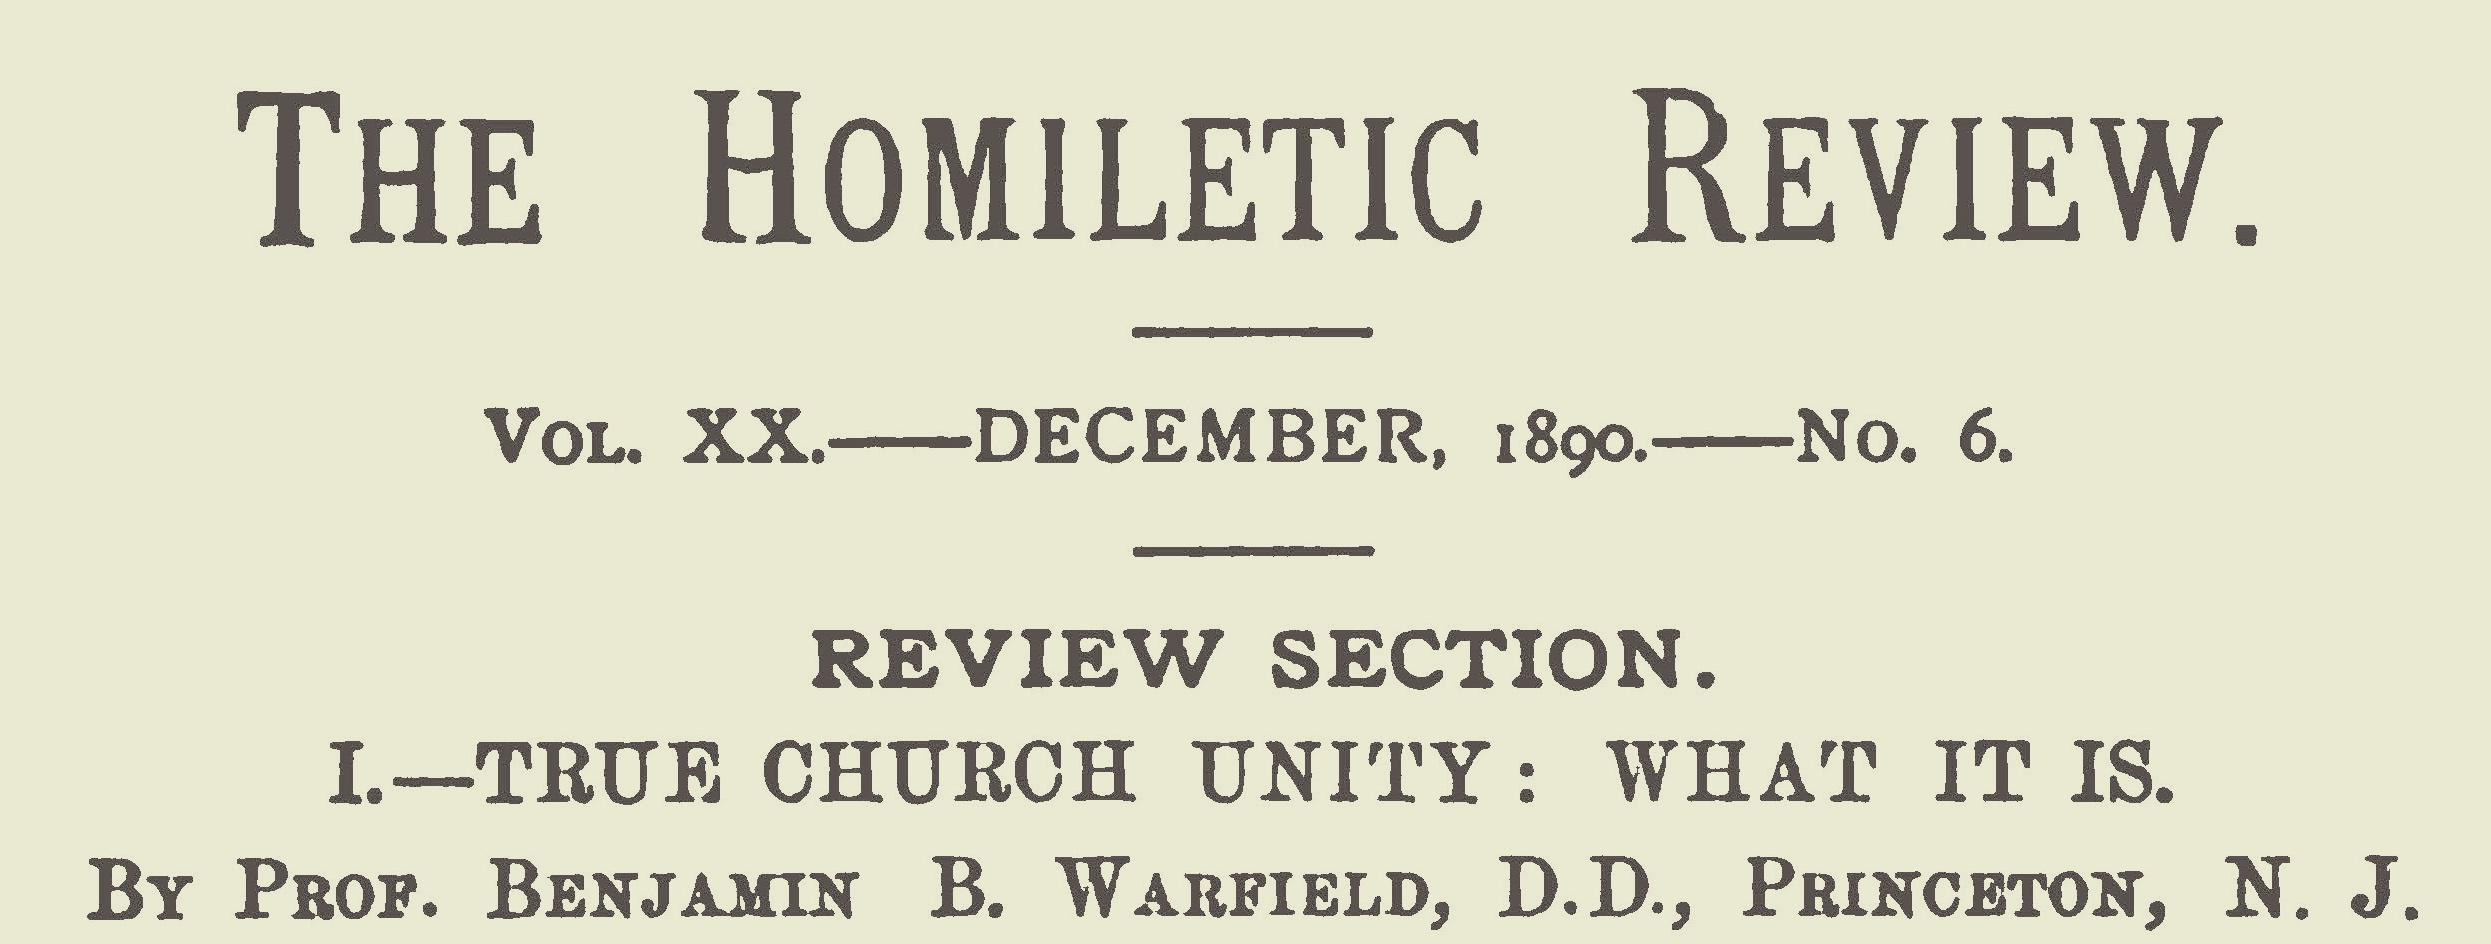 Warfield, Benjamin Breckinridge, True Church Unity What It Is Title Page.jpg